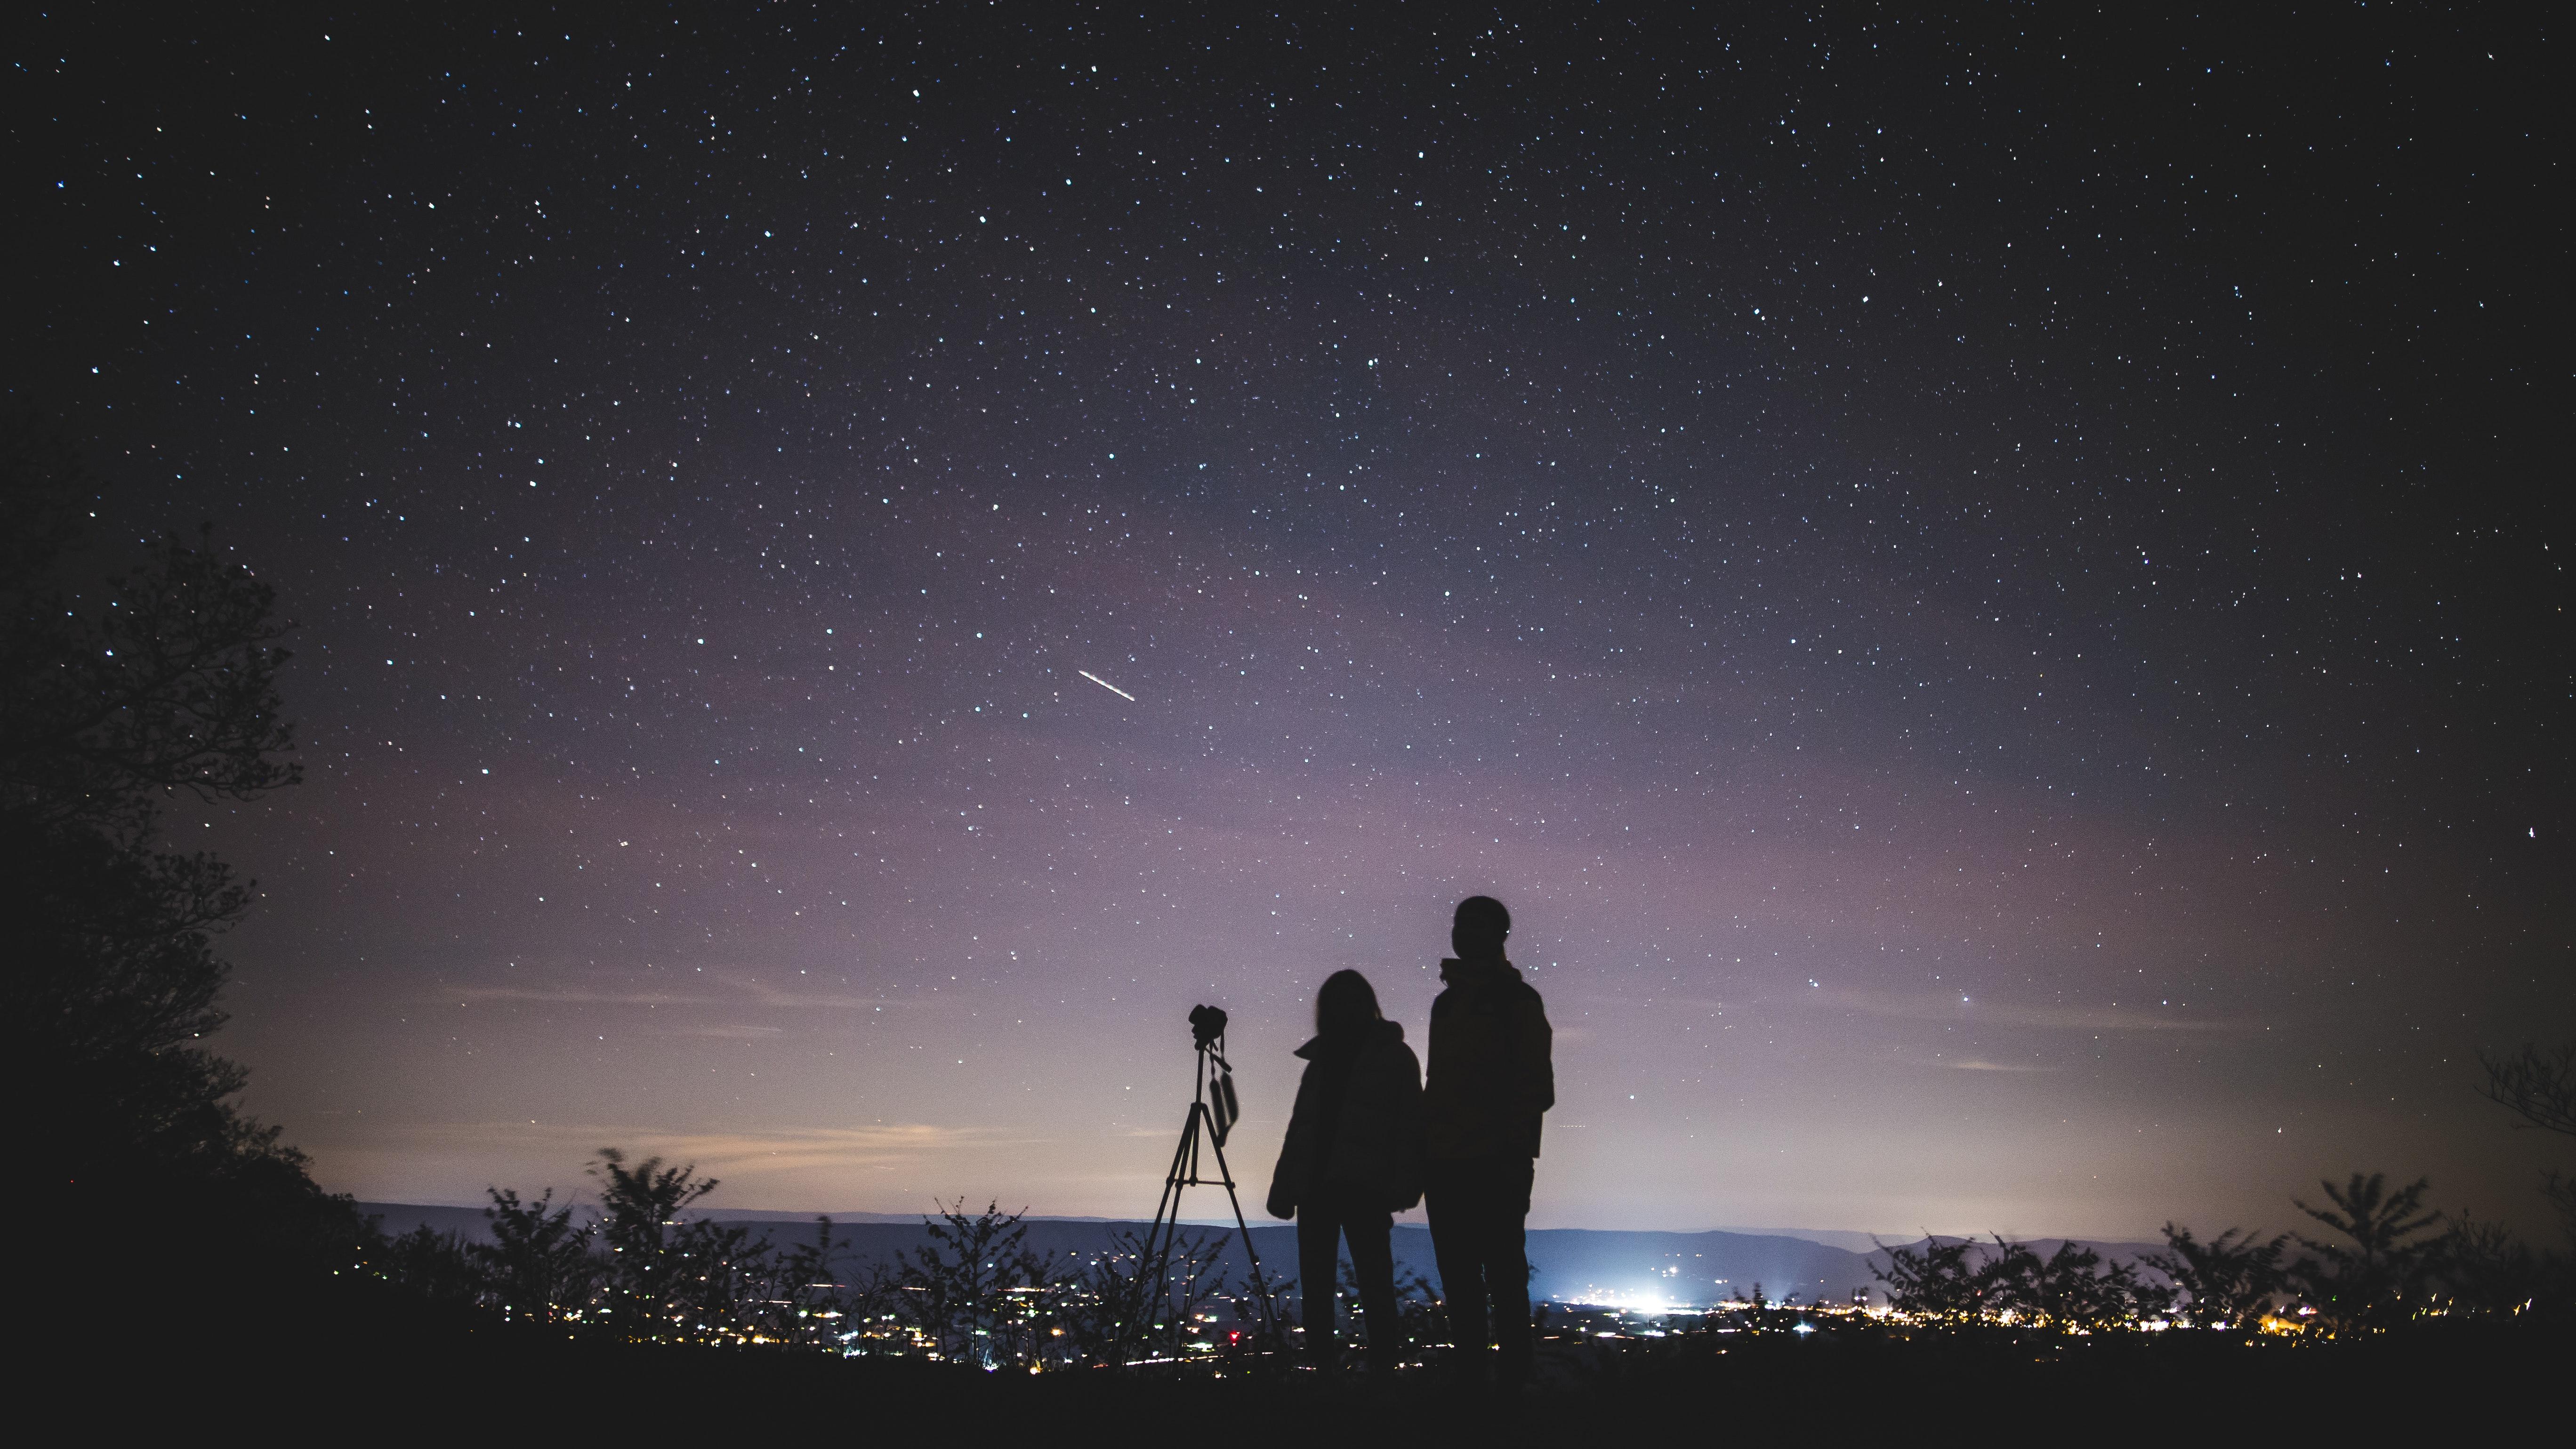 Gambar : dewasa, astronomi, astrophotography, konstelasi, sepasang